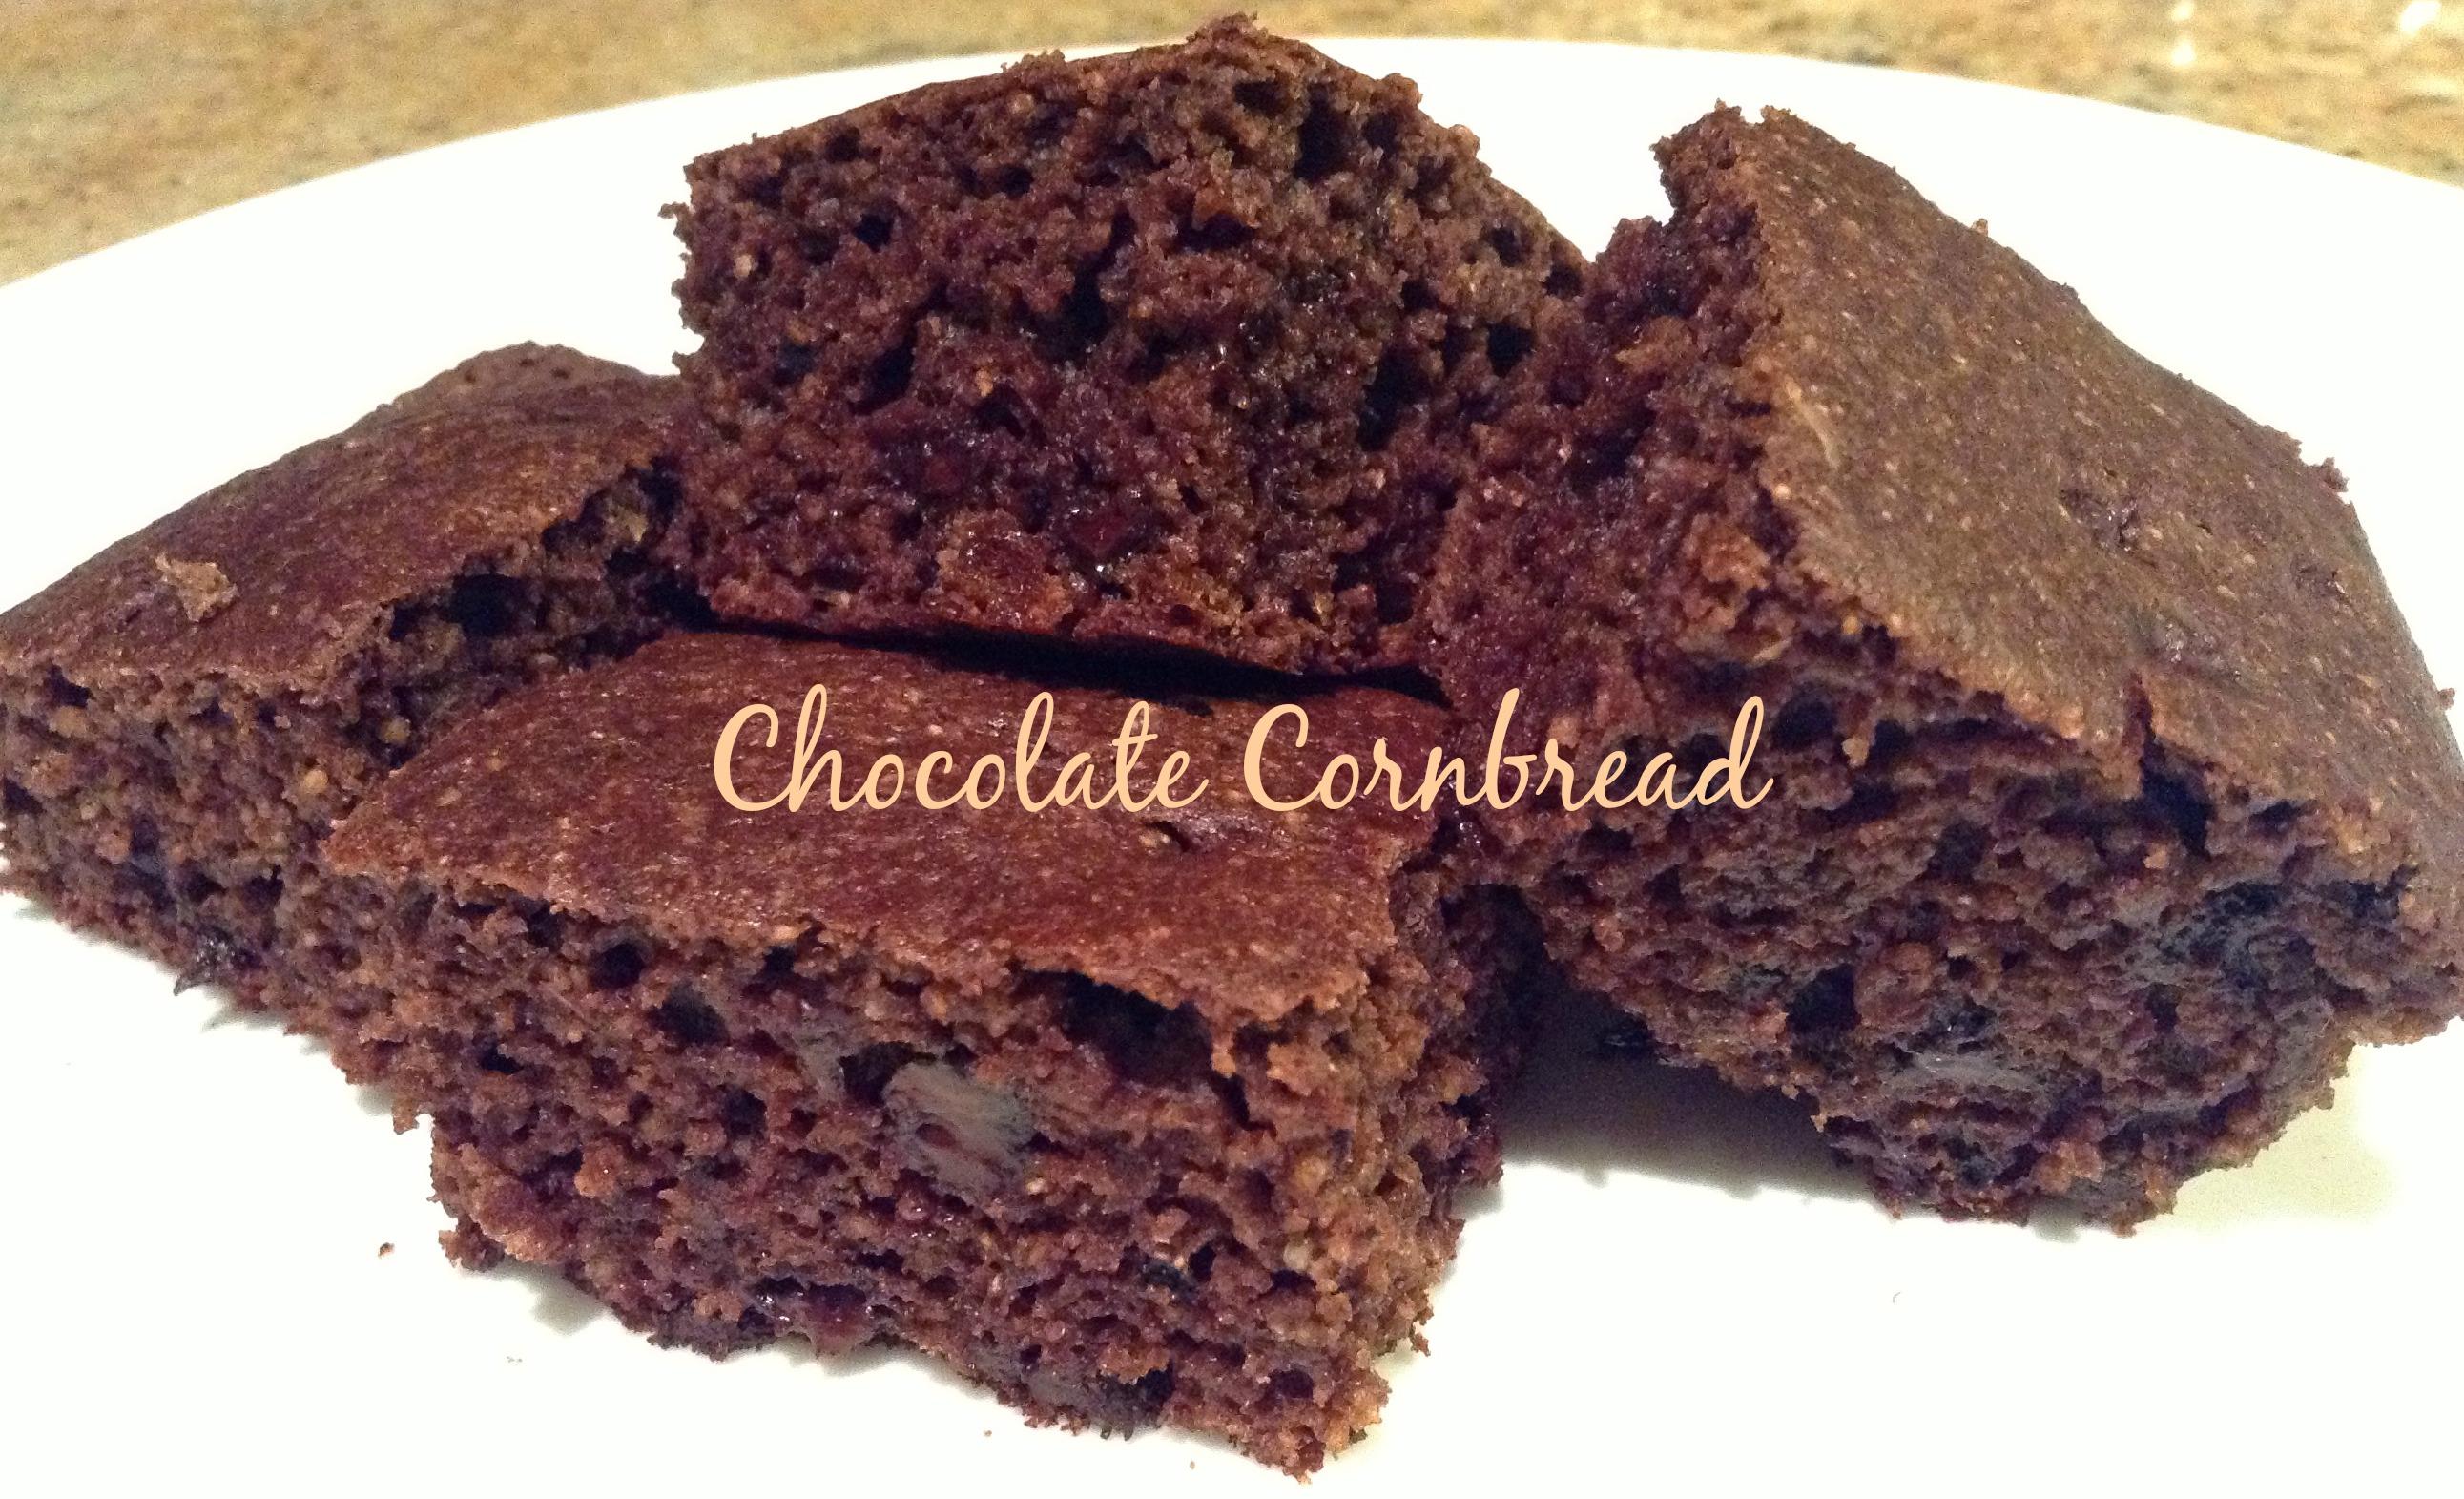 chocolatecornbread